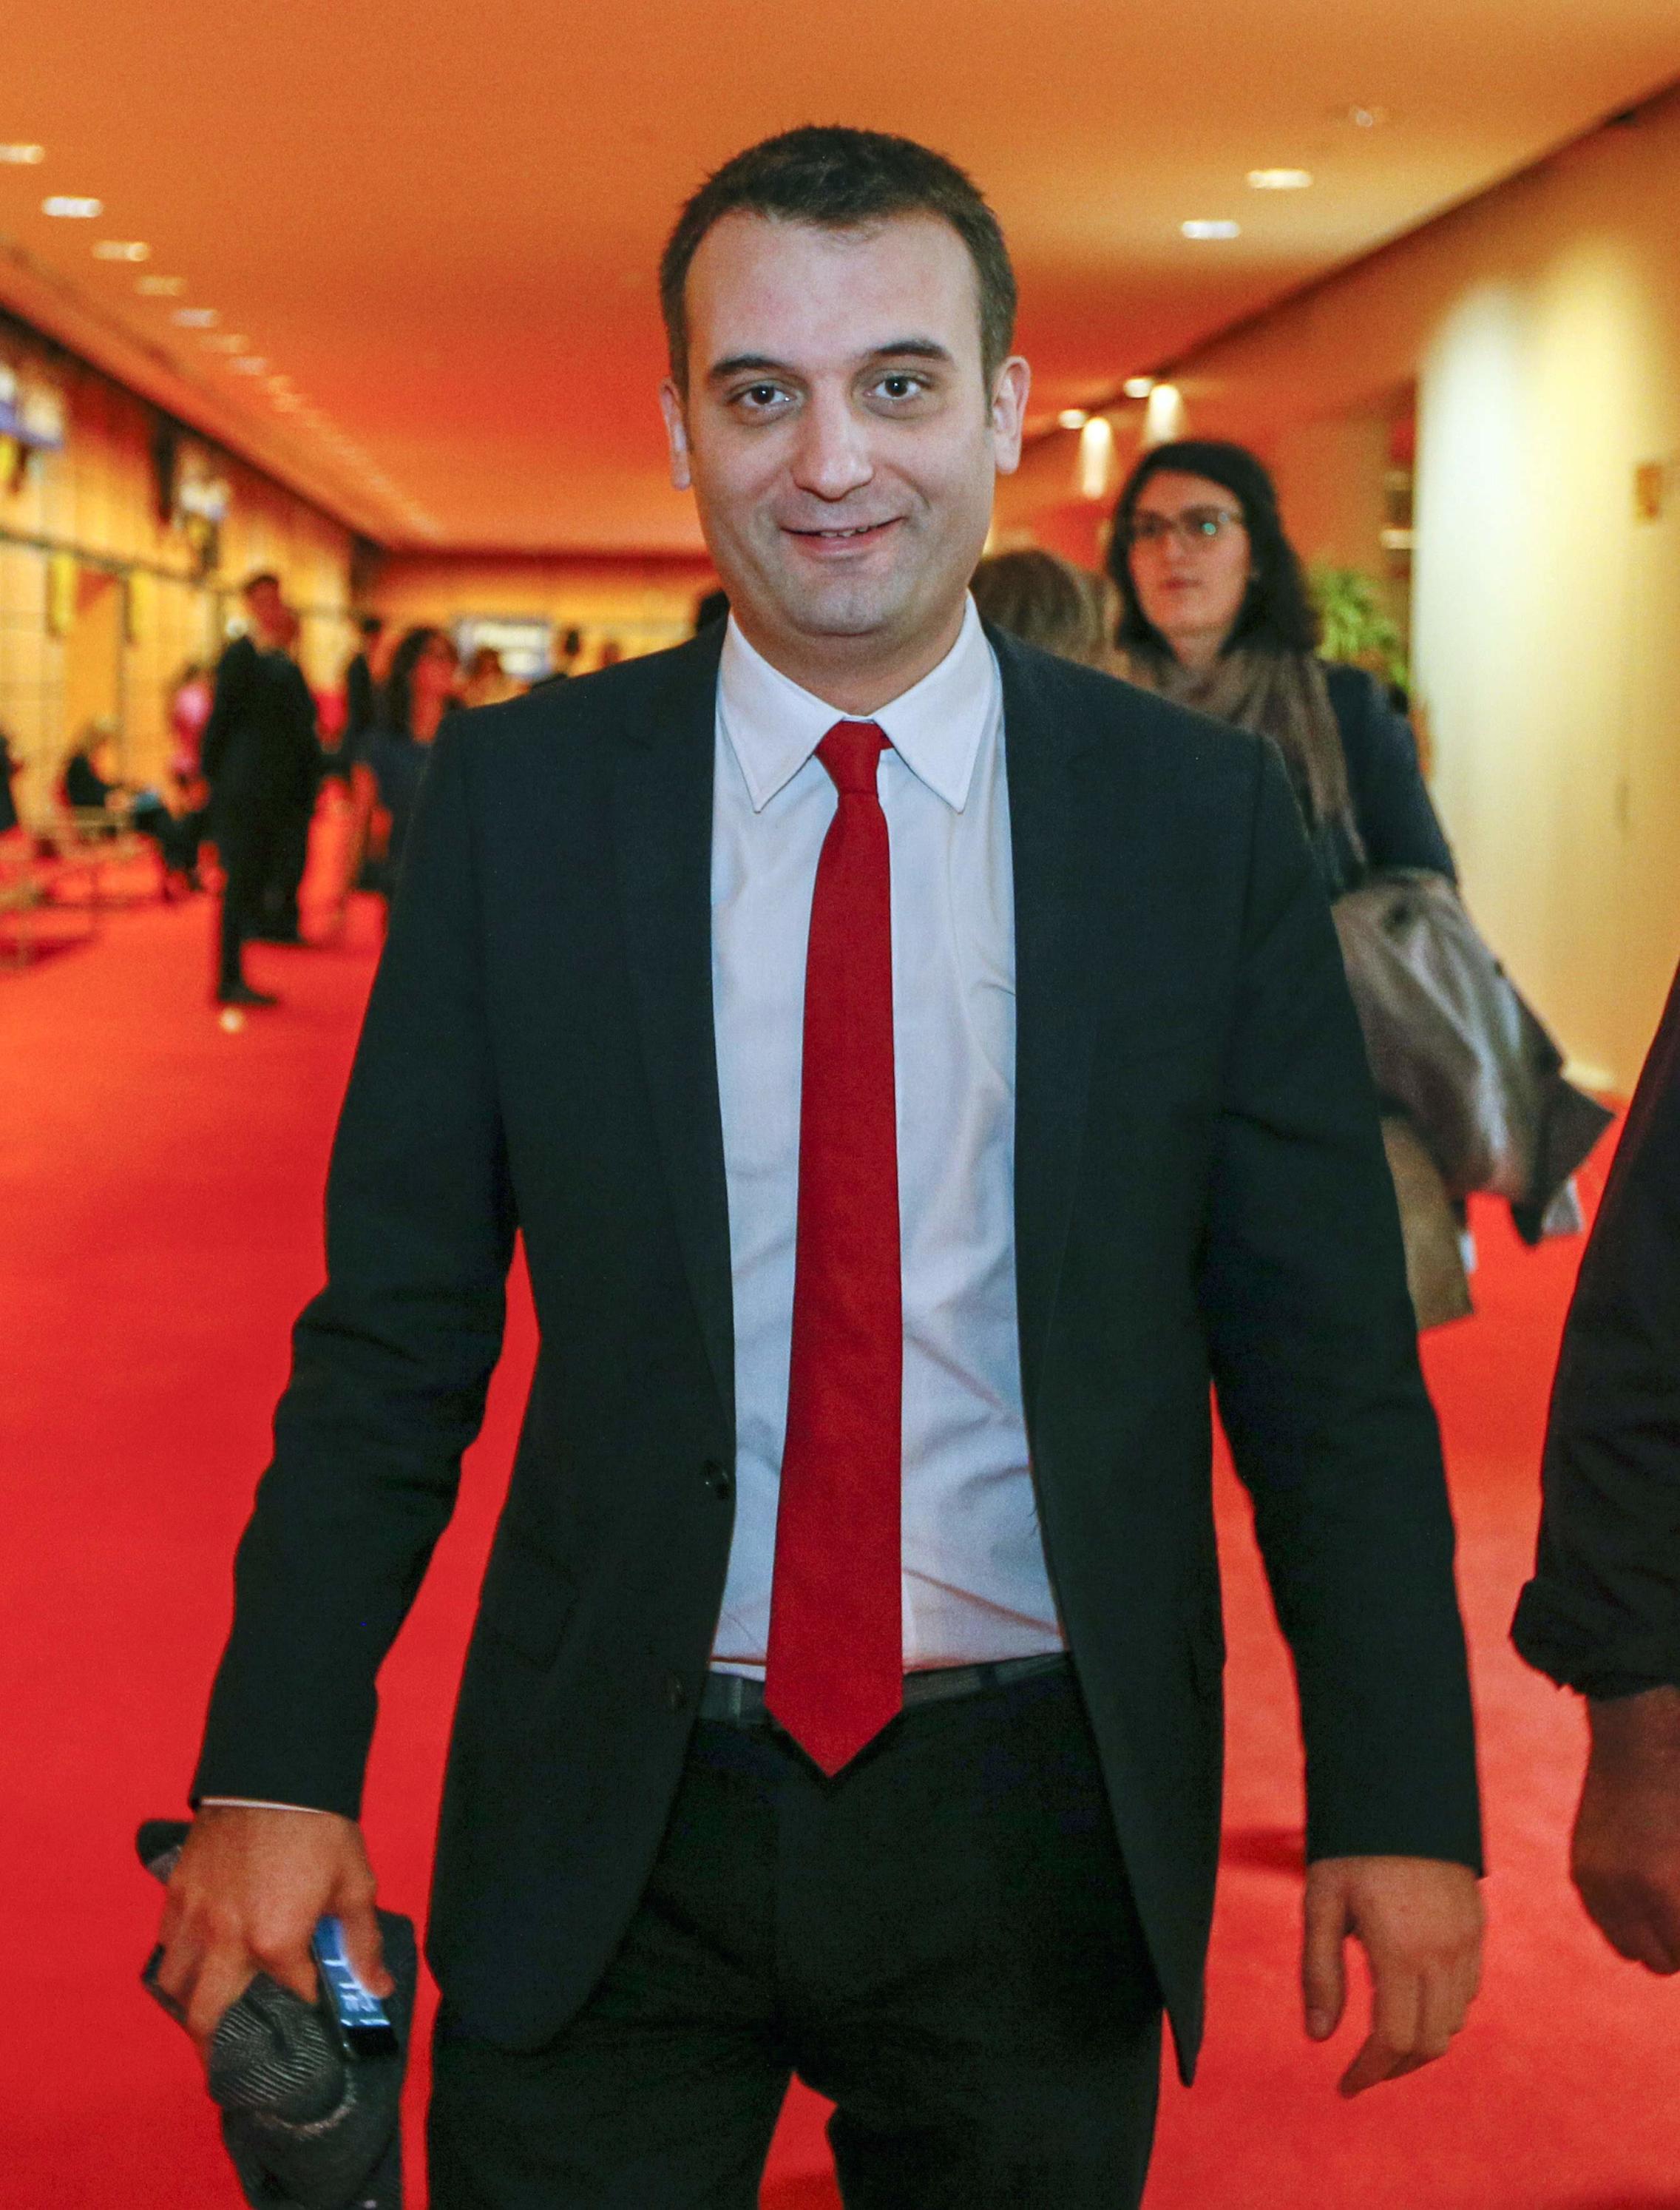 El vicepresidente del Frente Nacional, Florian Philippot (Reuters)